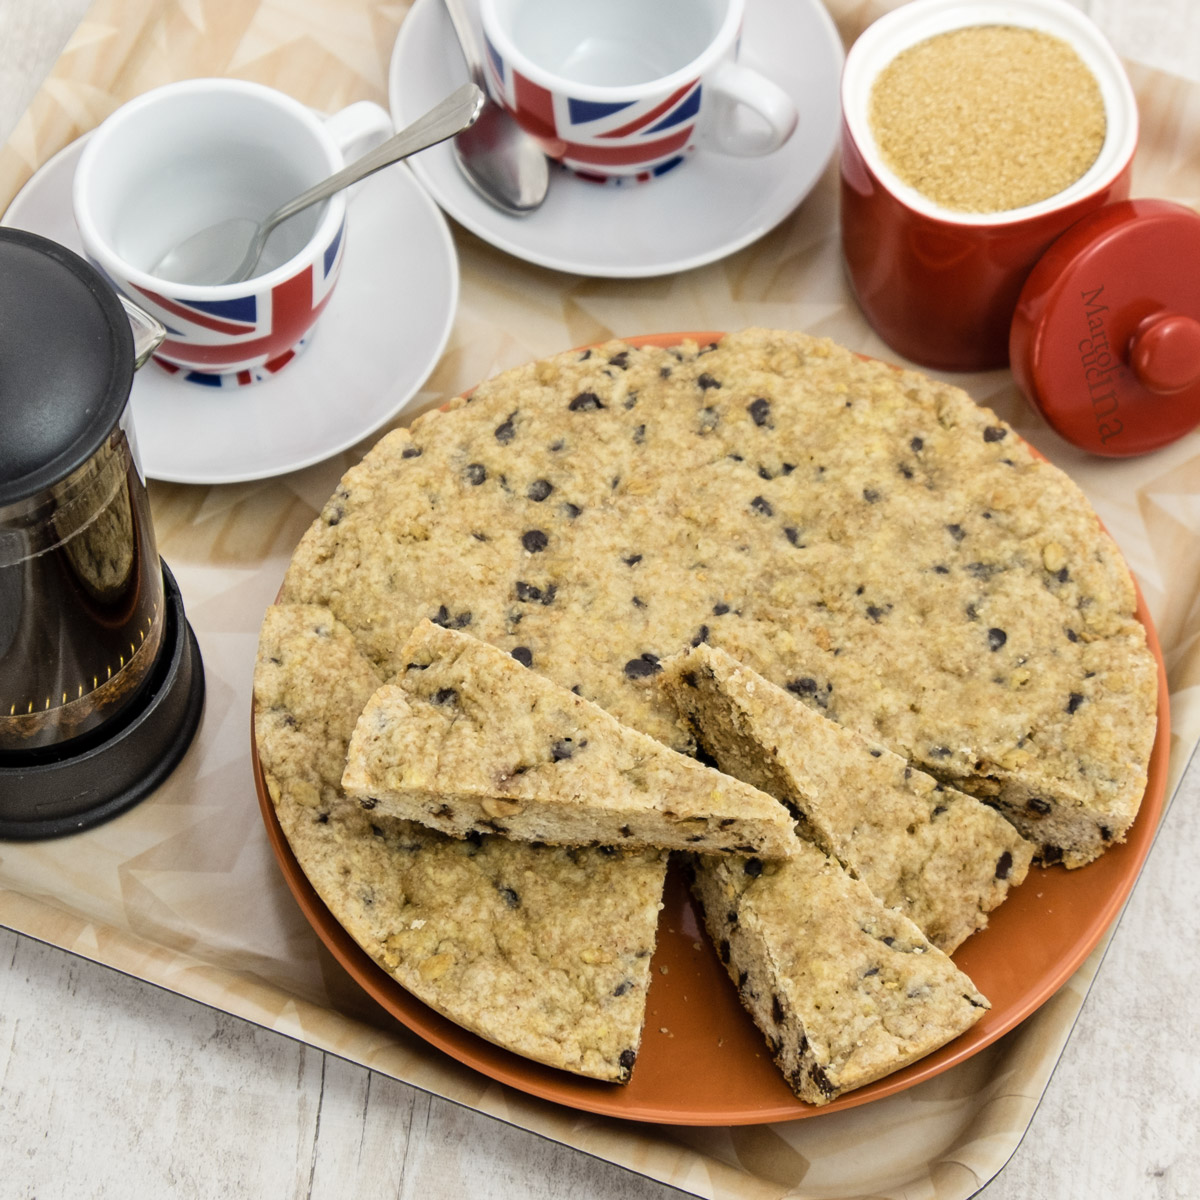 Torta cookies con esubero